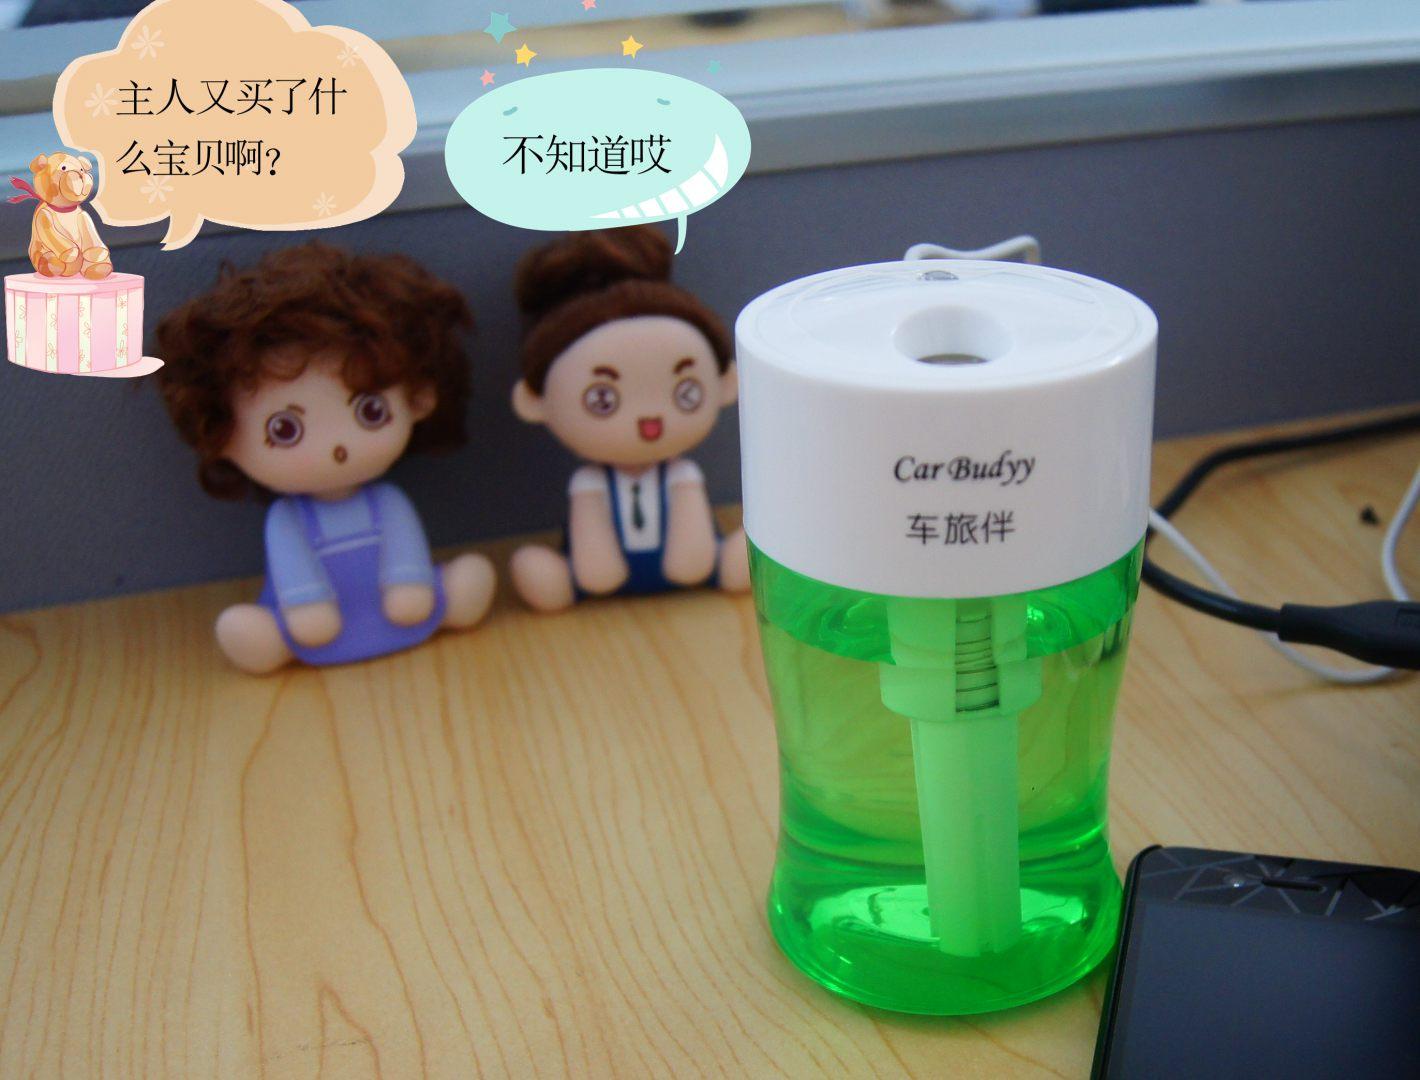 asics gel fit sana dsw 00244117 store